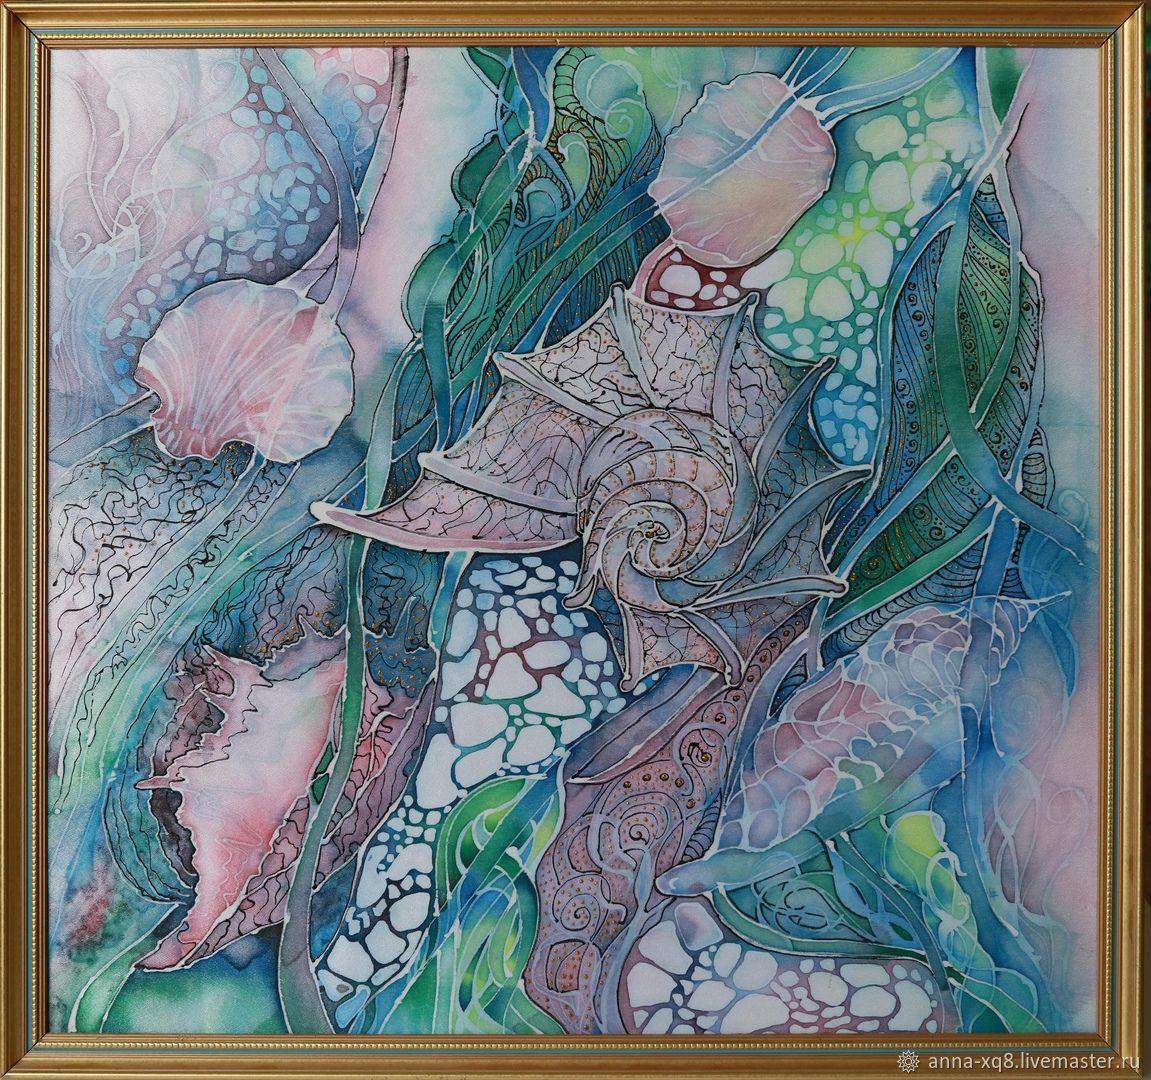 Картина Морские сокровища. Батик в раме, Картины, Рыбинск,  Фото №1